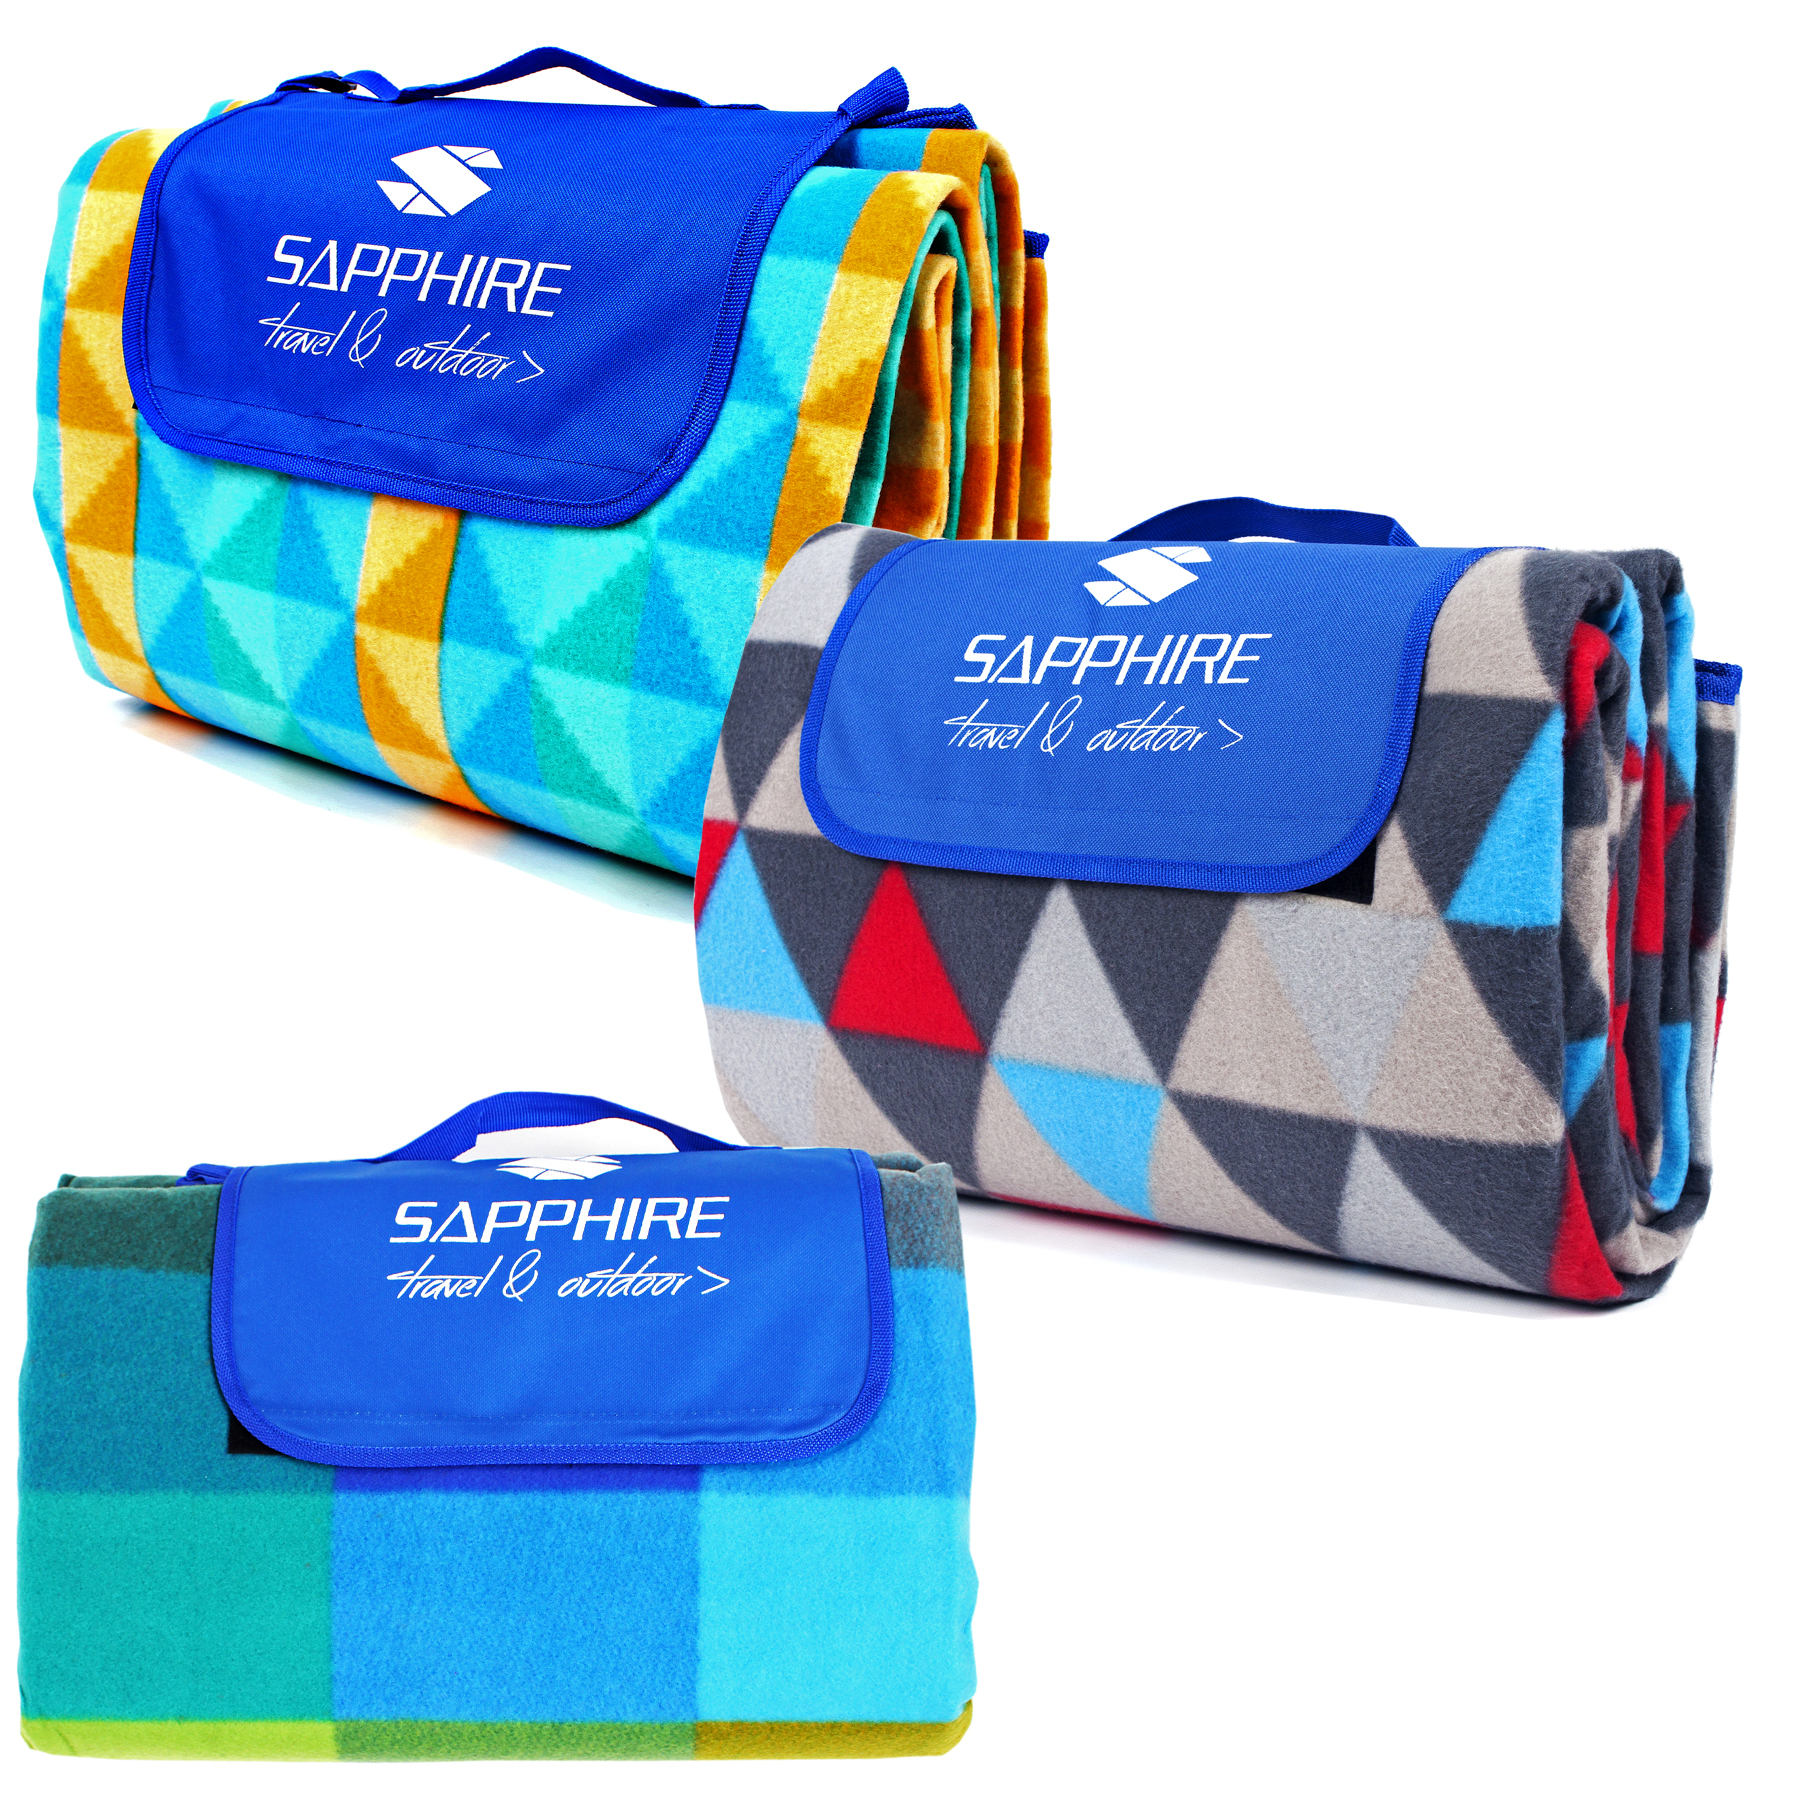 picknickdecke 200x200cm campingdecke stranddecke decke reisedecke picknick matte ebay. Black Bedroom Furniture Sets. Home Design Ideas